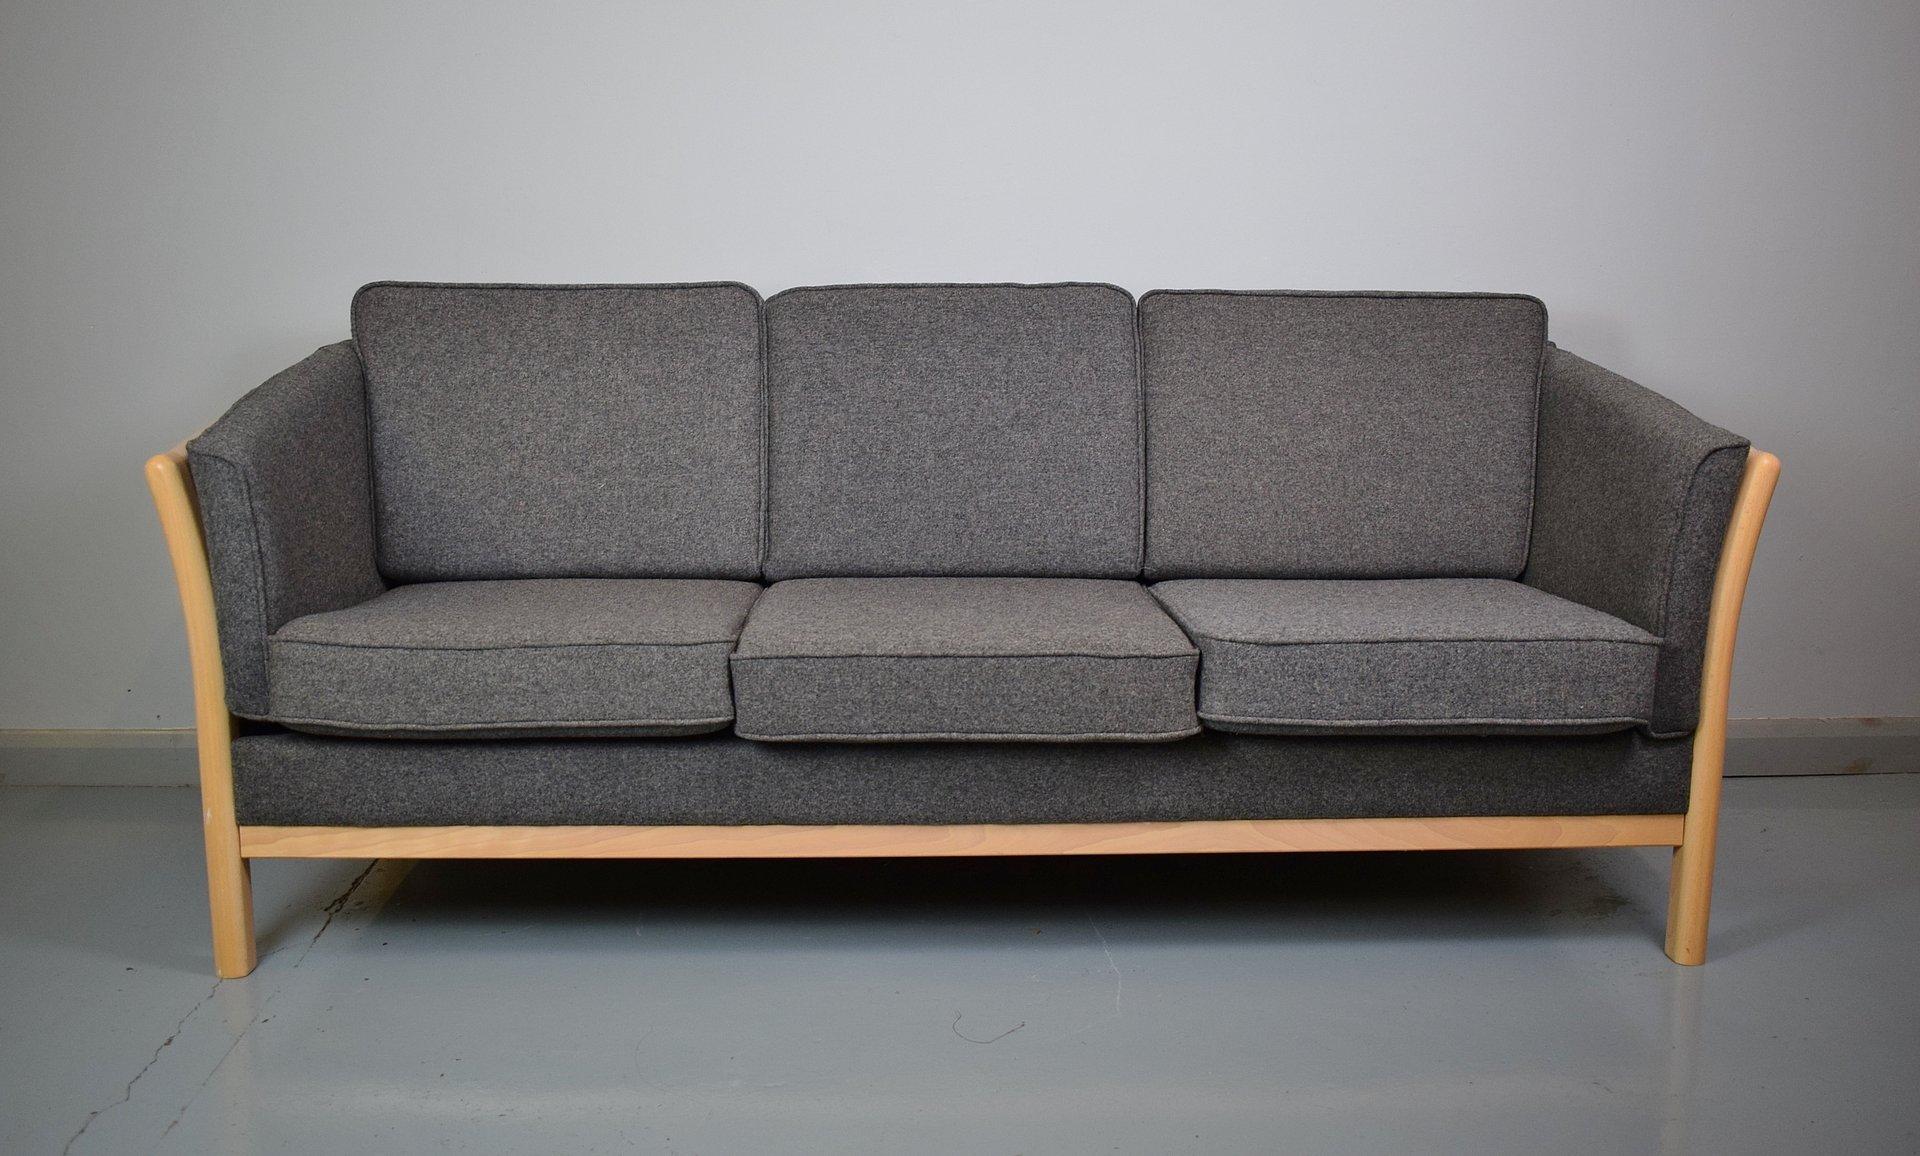 Vintage Danish Wool Sofa, 1970s